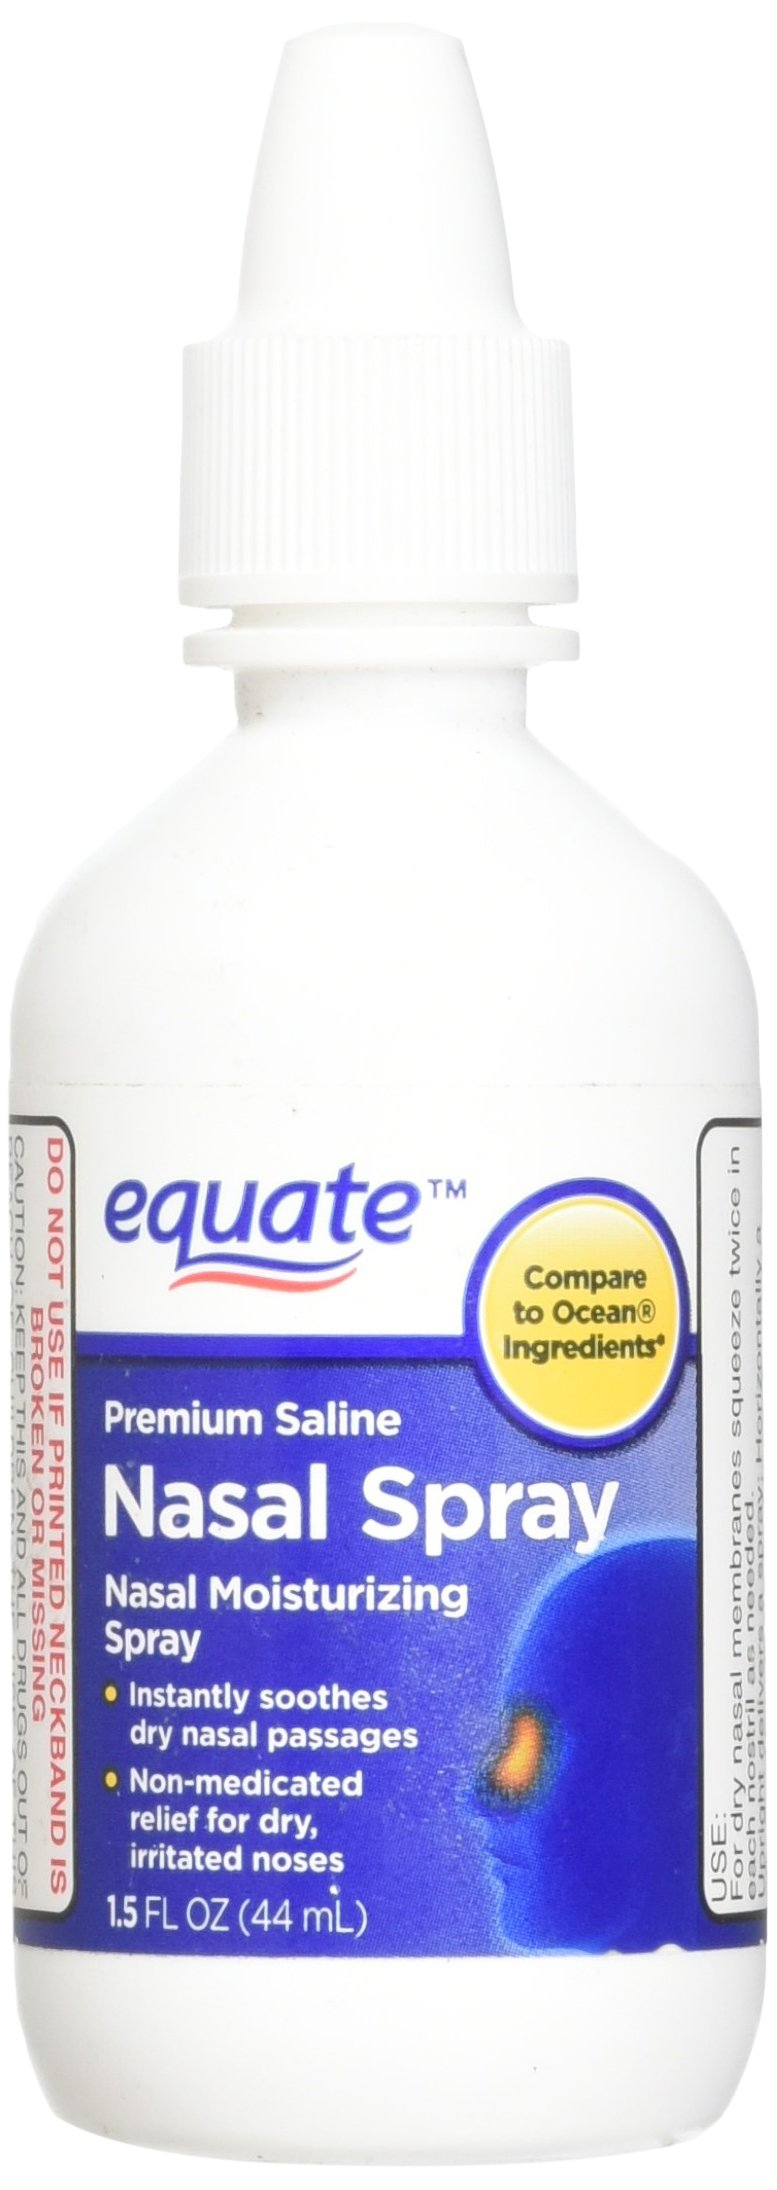 Equate - Saline Nasal Spray, 1.5 oz (Compare to Ocean Ingredients)